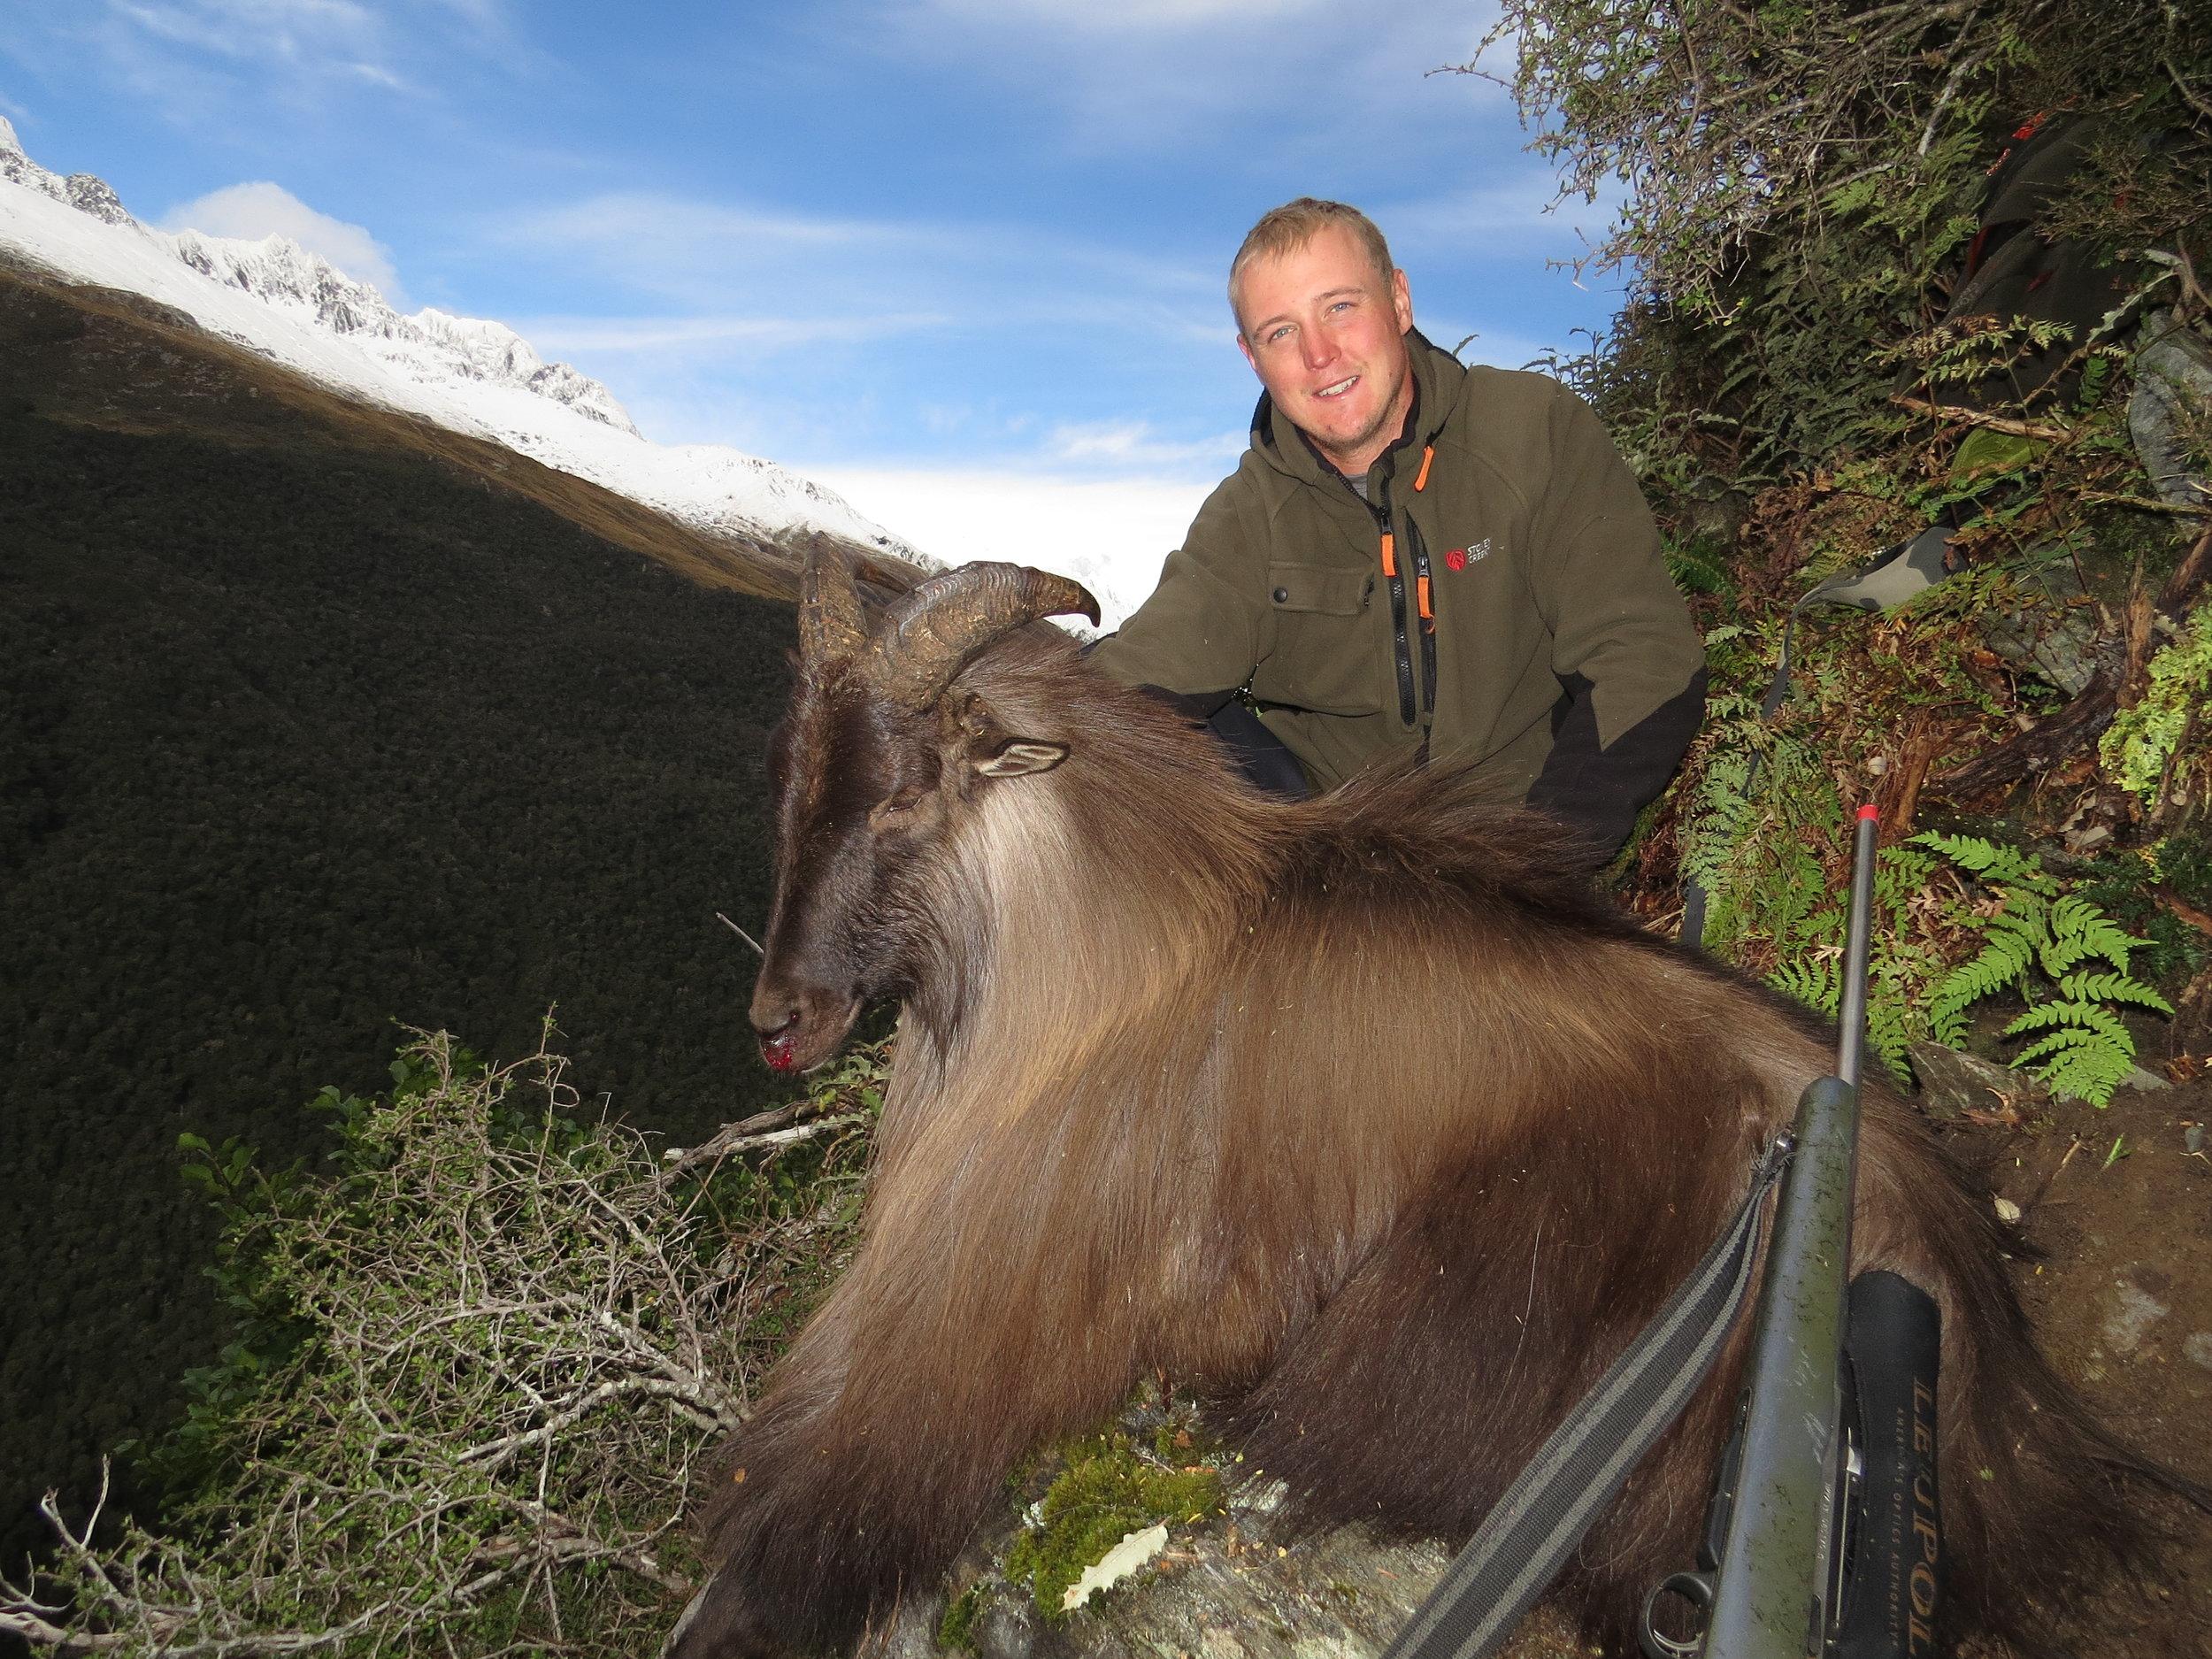 Luke Potts with his 13 1/4 inch scrub bull - Photo by Ryan Carr